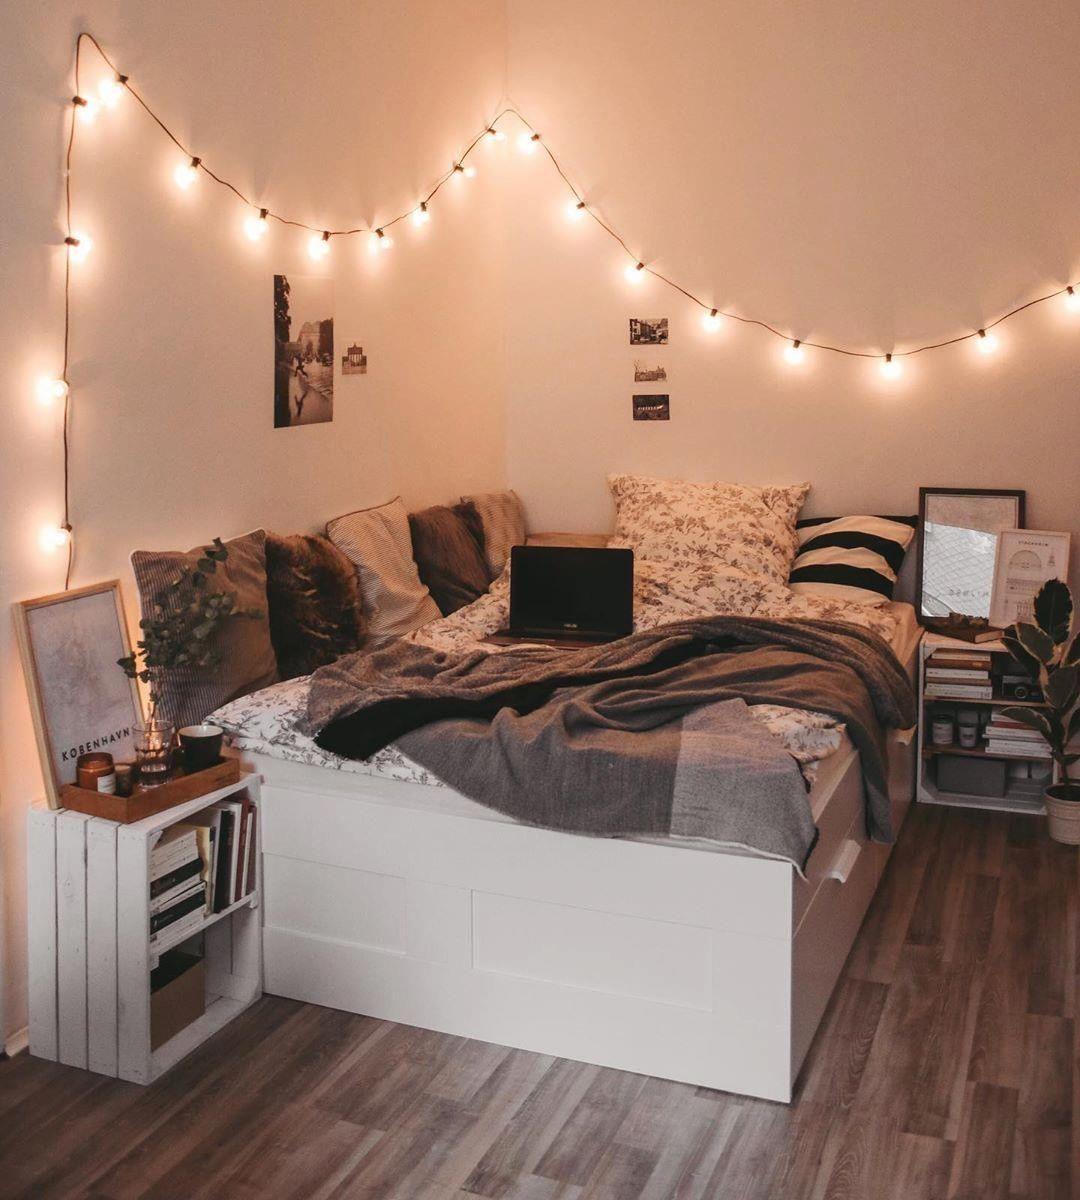 Provenance De La Photo Instagram Mybedroomgoals Interiordesign Interiors Insp En 2020 Idee Deco Chambre Moderne Decoration Chambre Cocooning Deco Petite Chambre